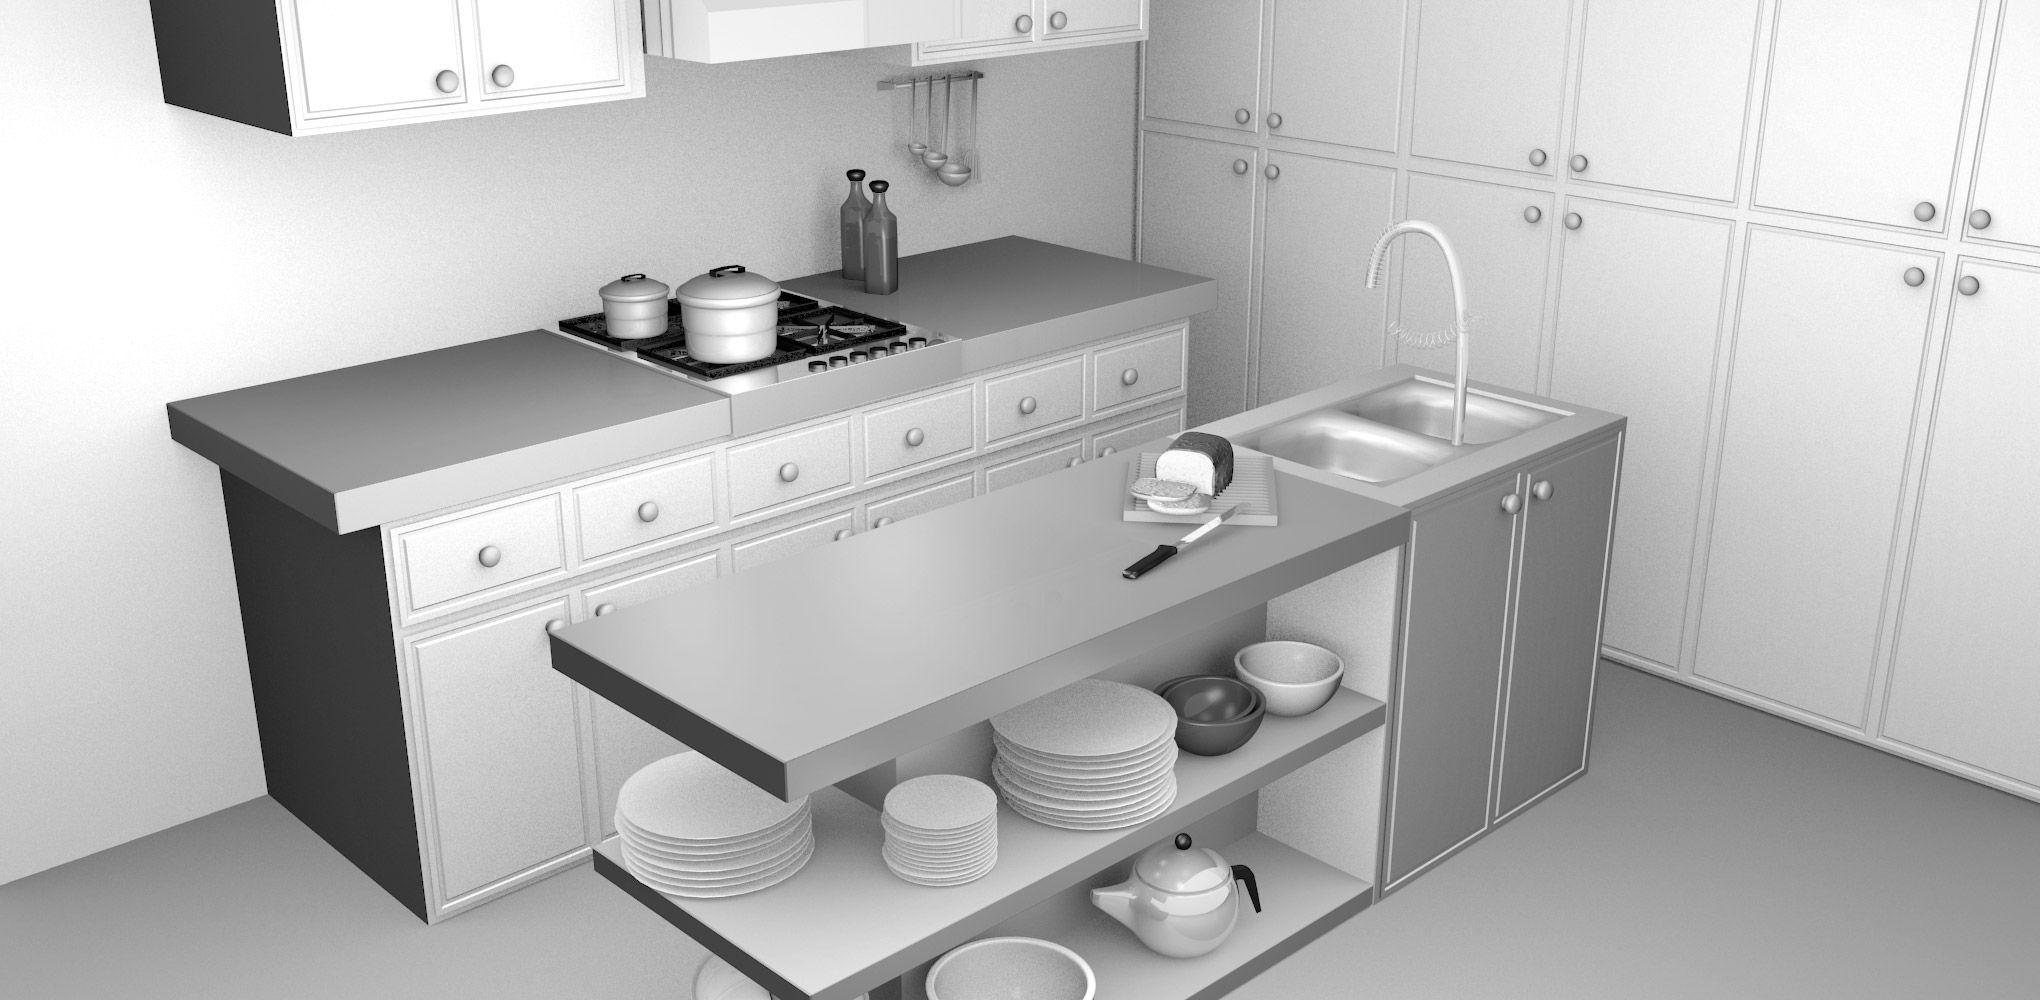 Ordinaire Blender 3D Kitchen Model Blender 3D Architecture Renders